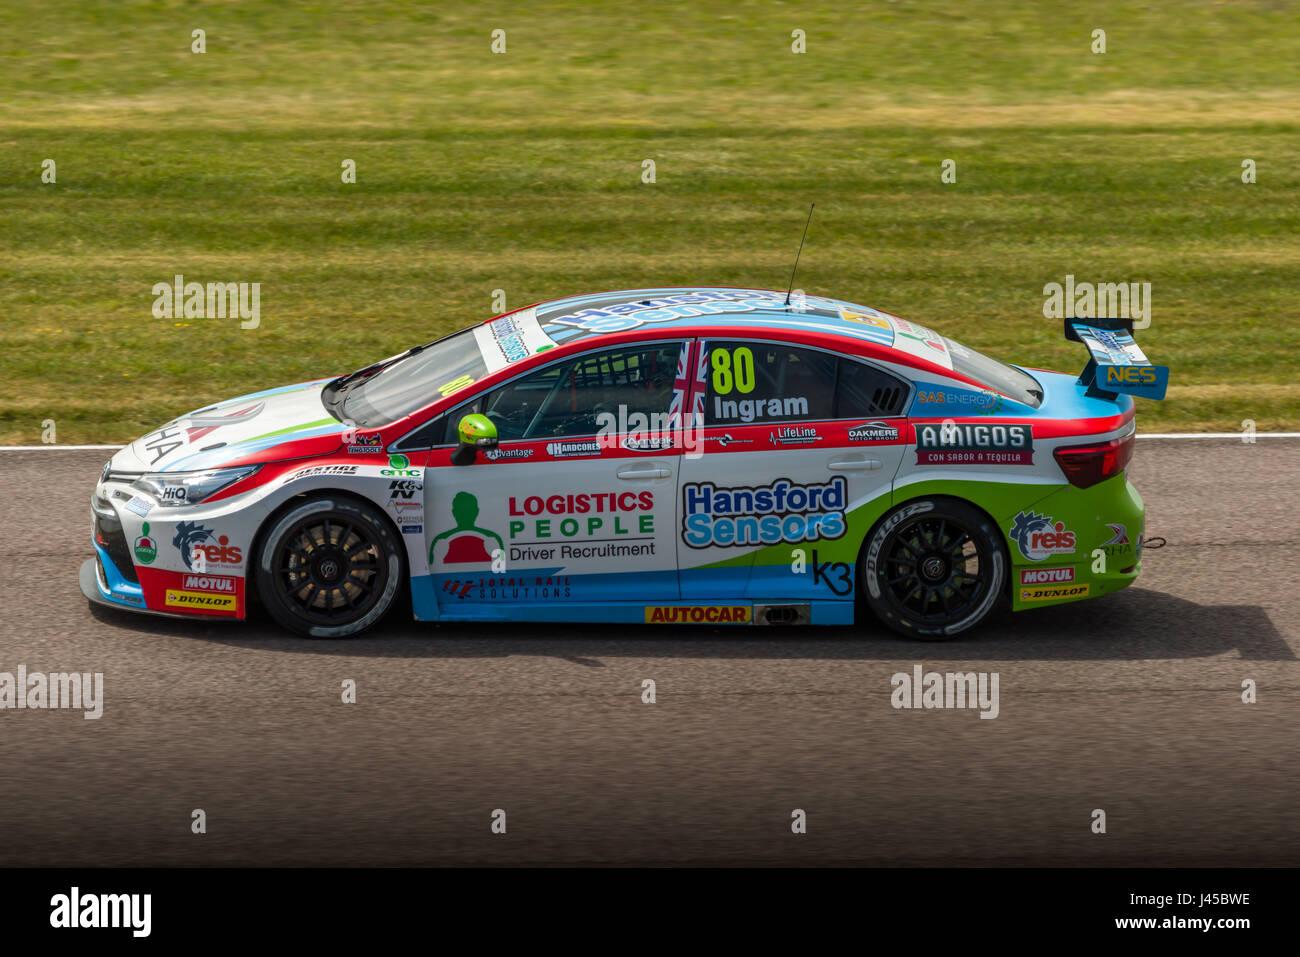 BTCC Driver Tom Ingram competing at Thruxton Circuit, Hampshire, on Sunday 7th May 2017. - Stock Image